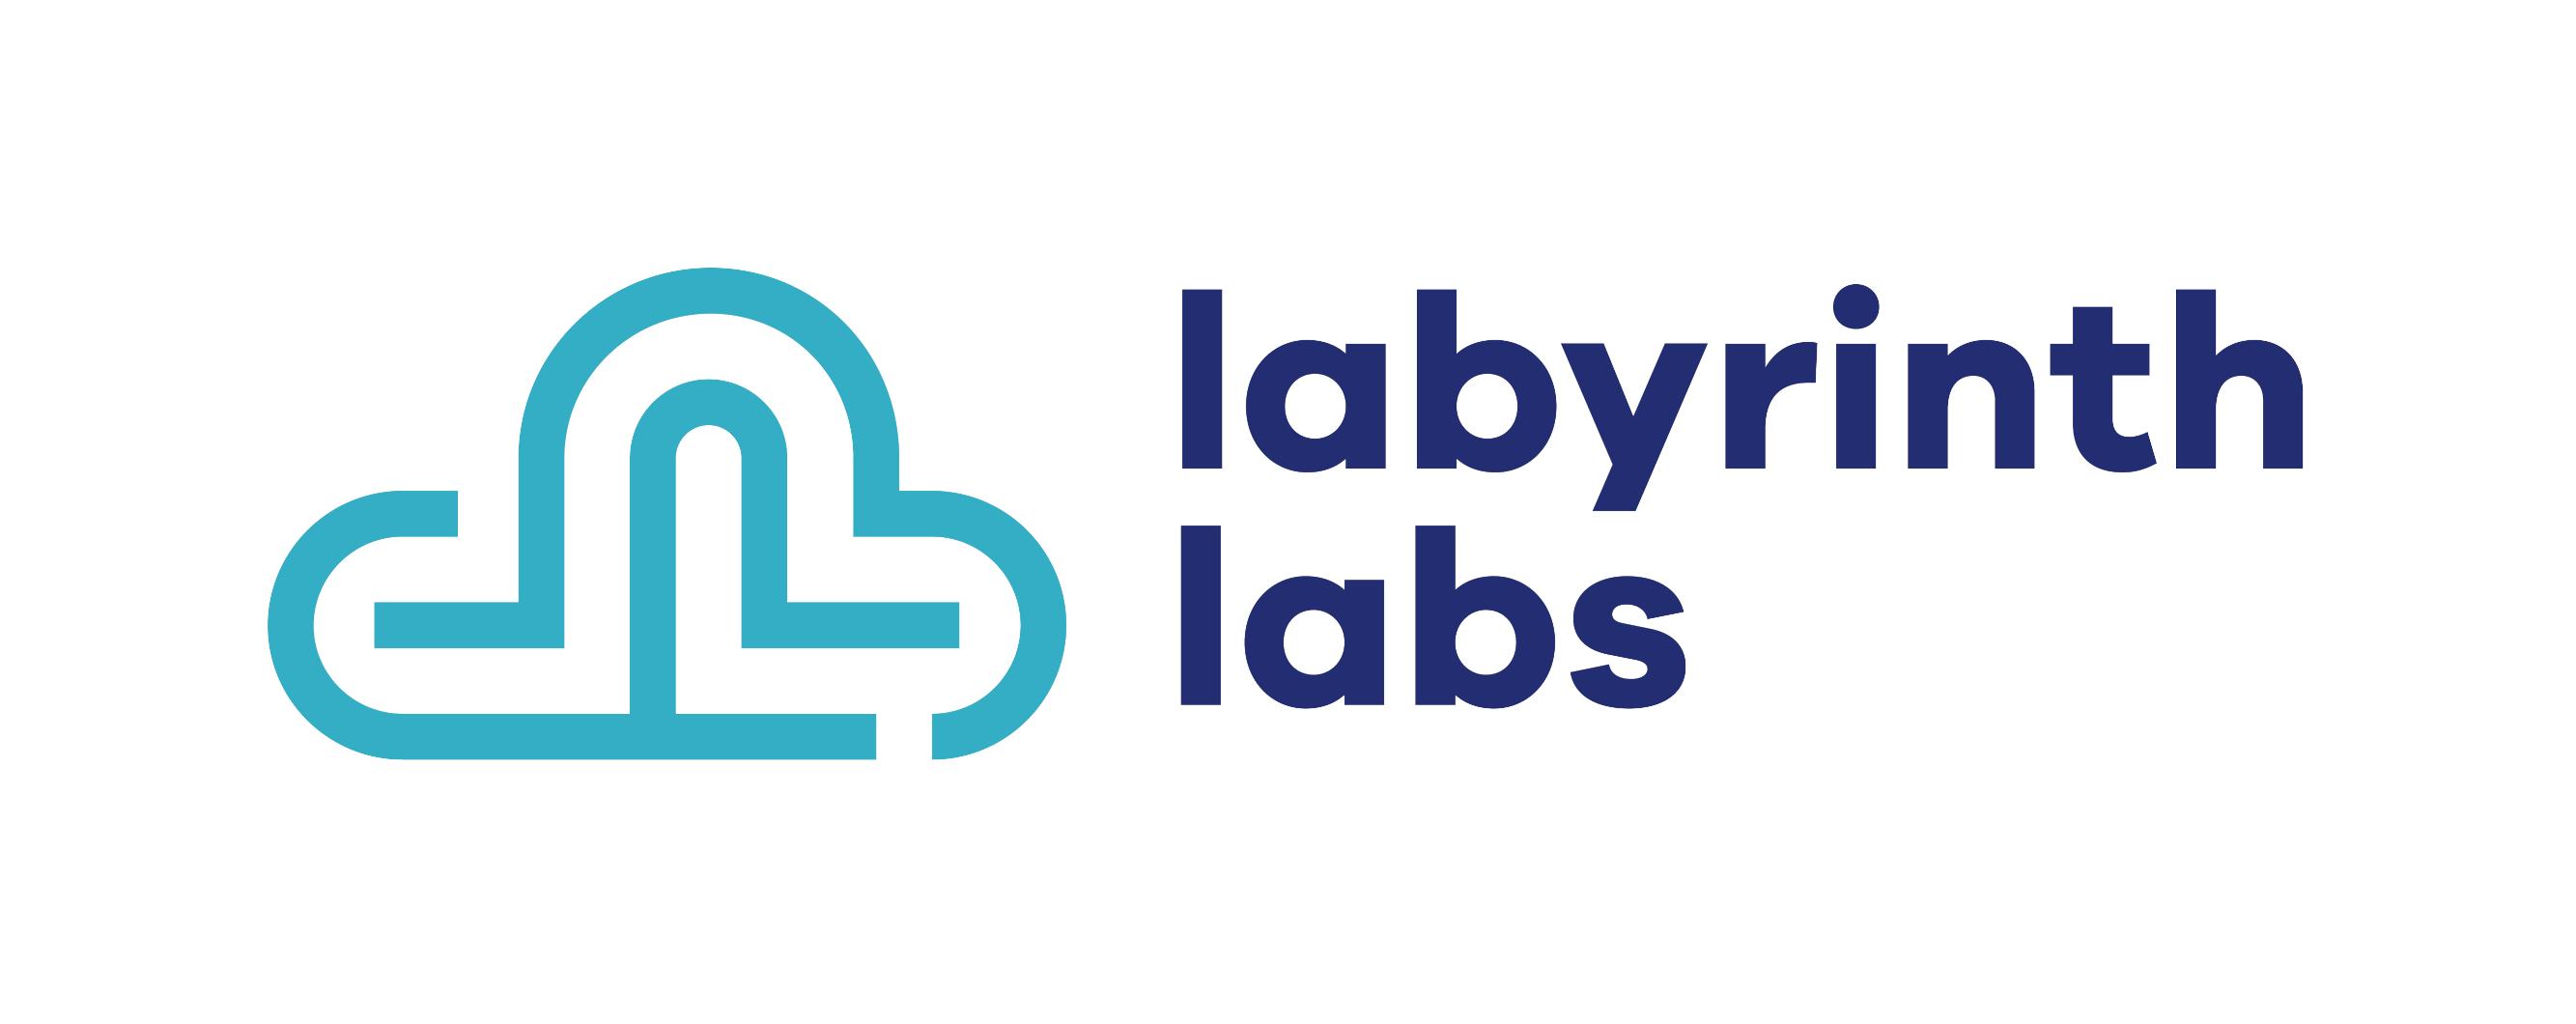 LabyrinthLabs